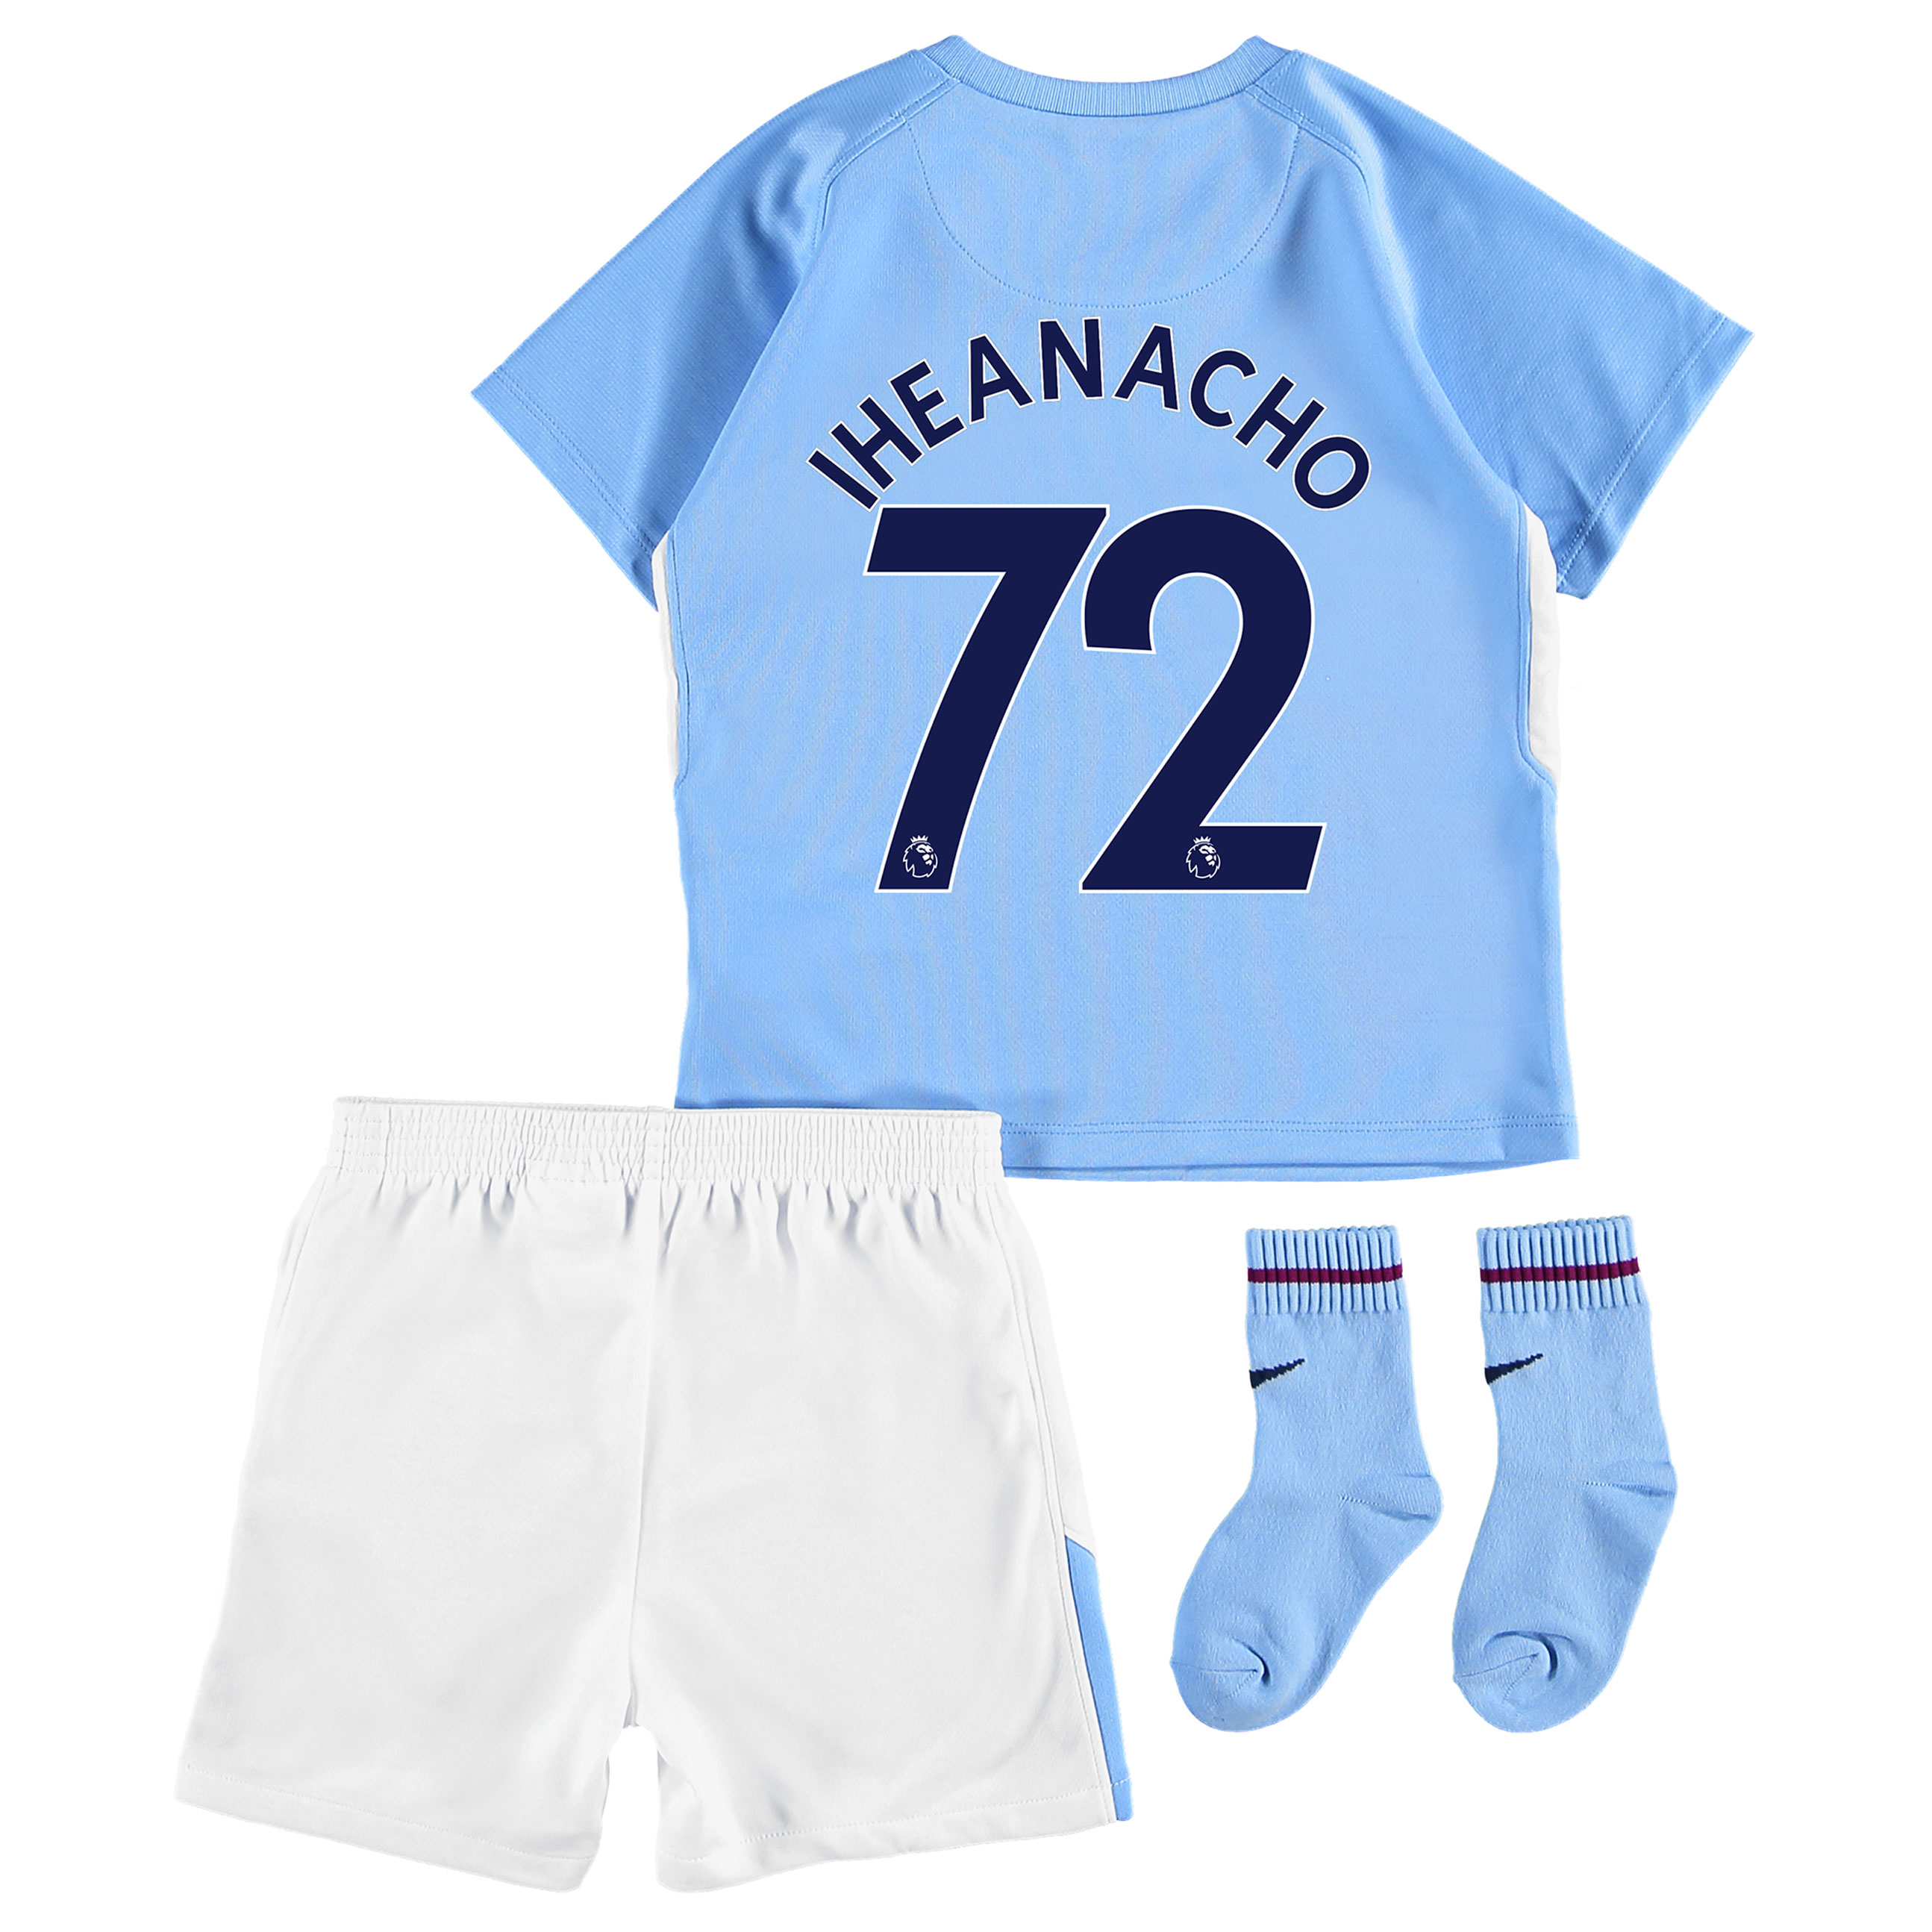 Manchester City Home Stadium Kit 2017-18 - Infants with Iheanacho 72 p